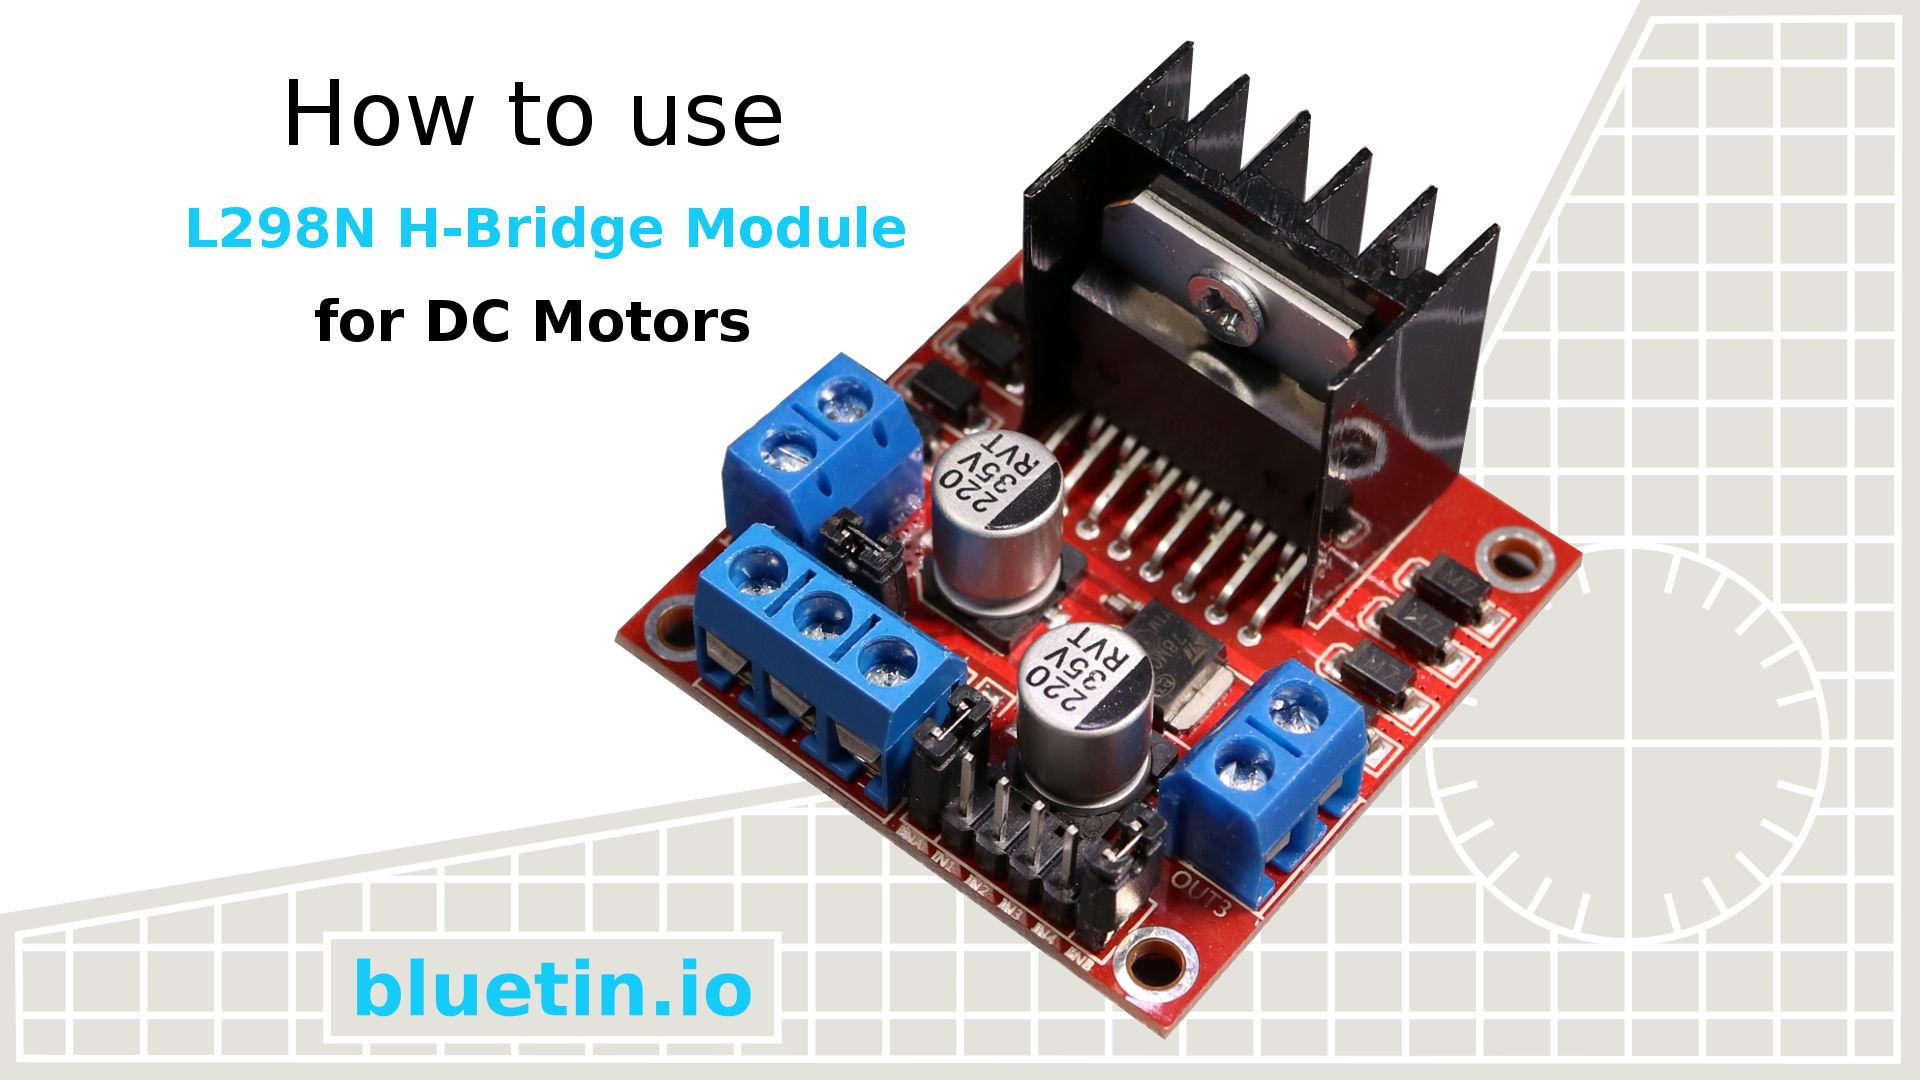 L298n h bridge dc motor driver module quick start guide for Dc motor h bridge